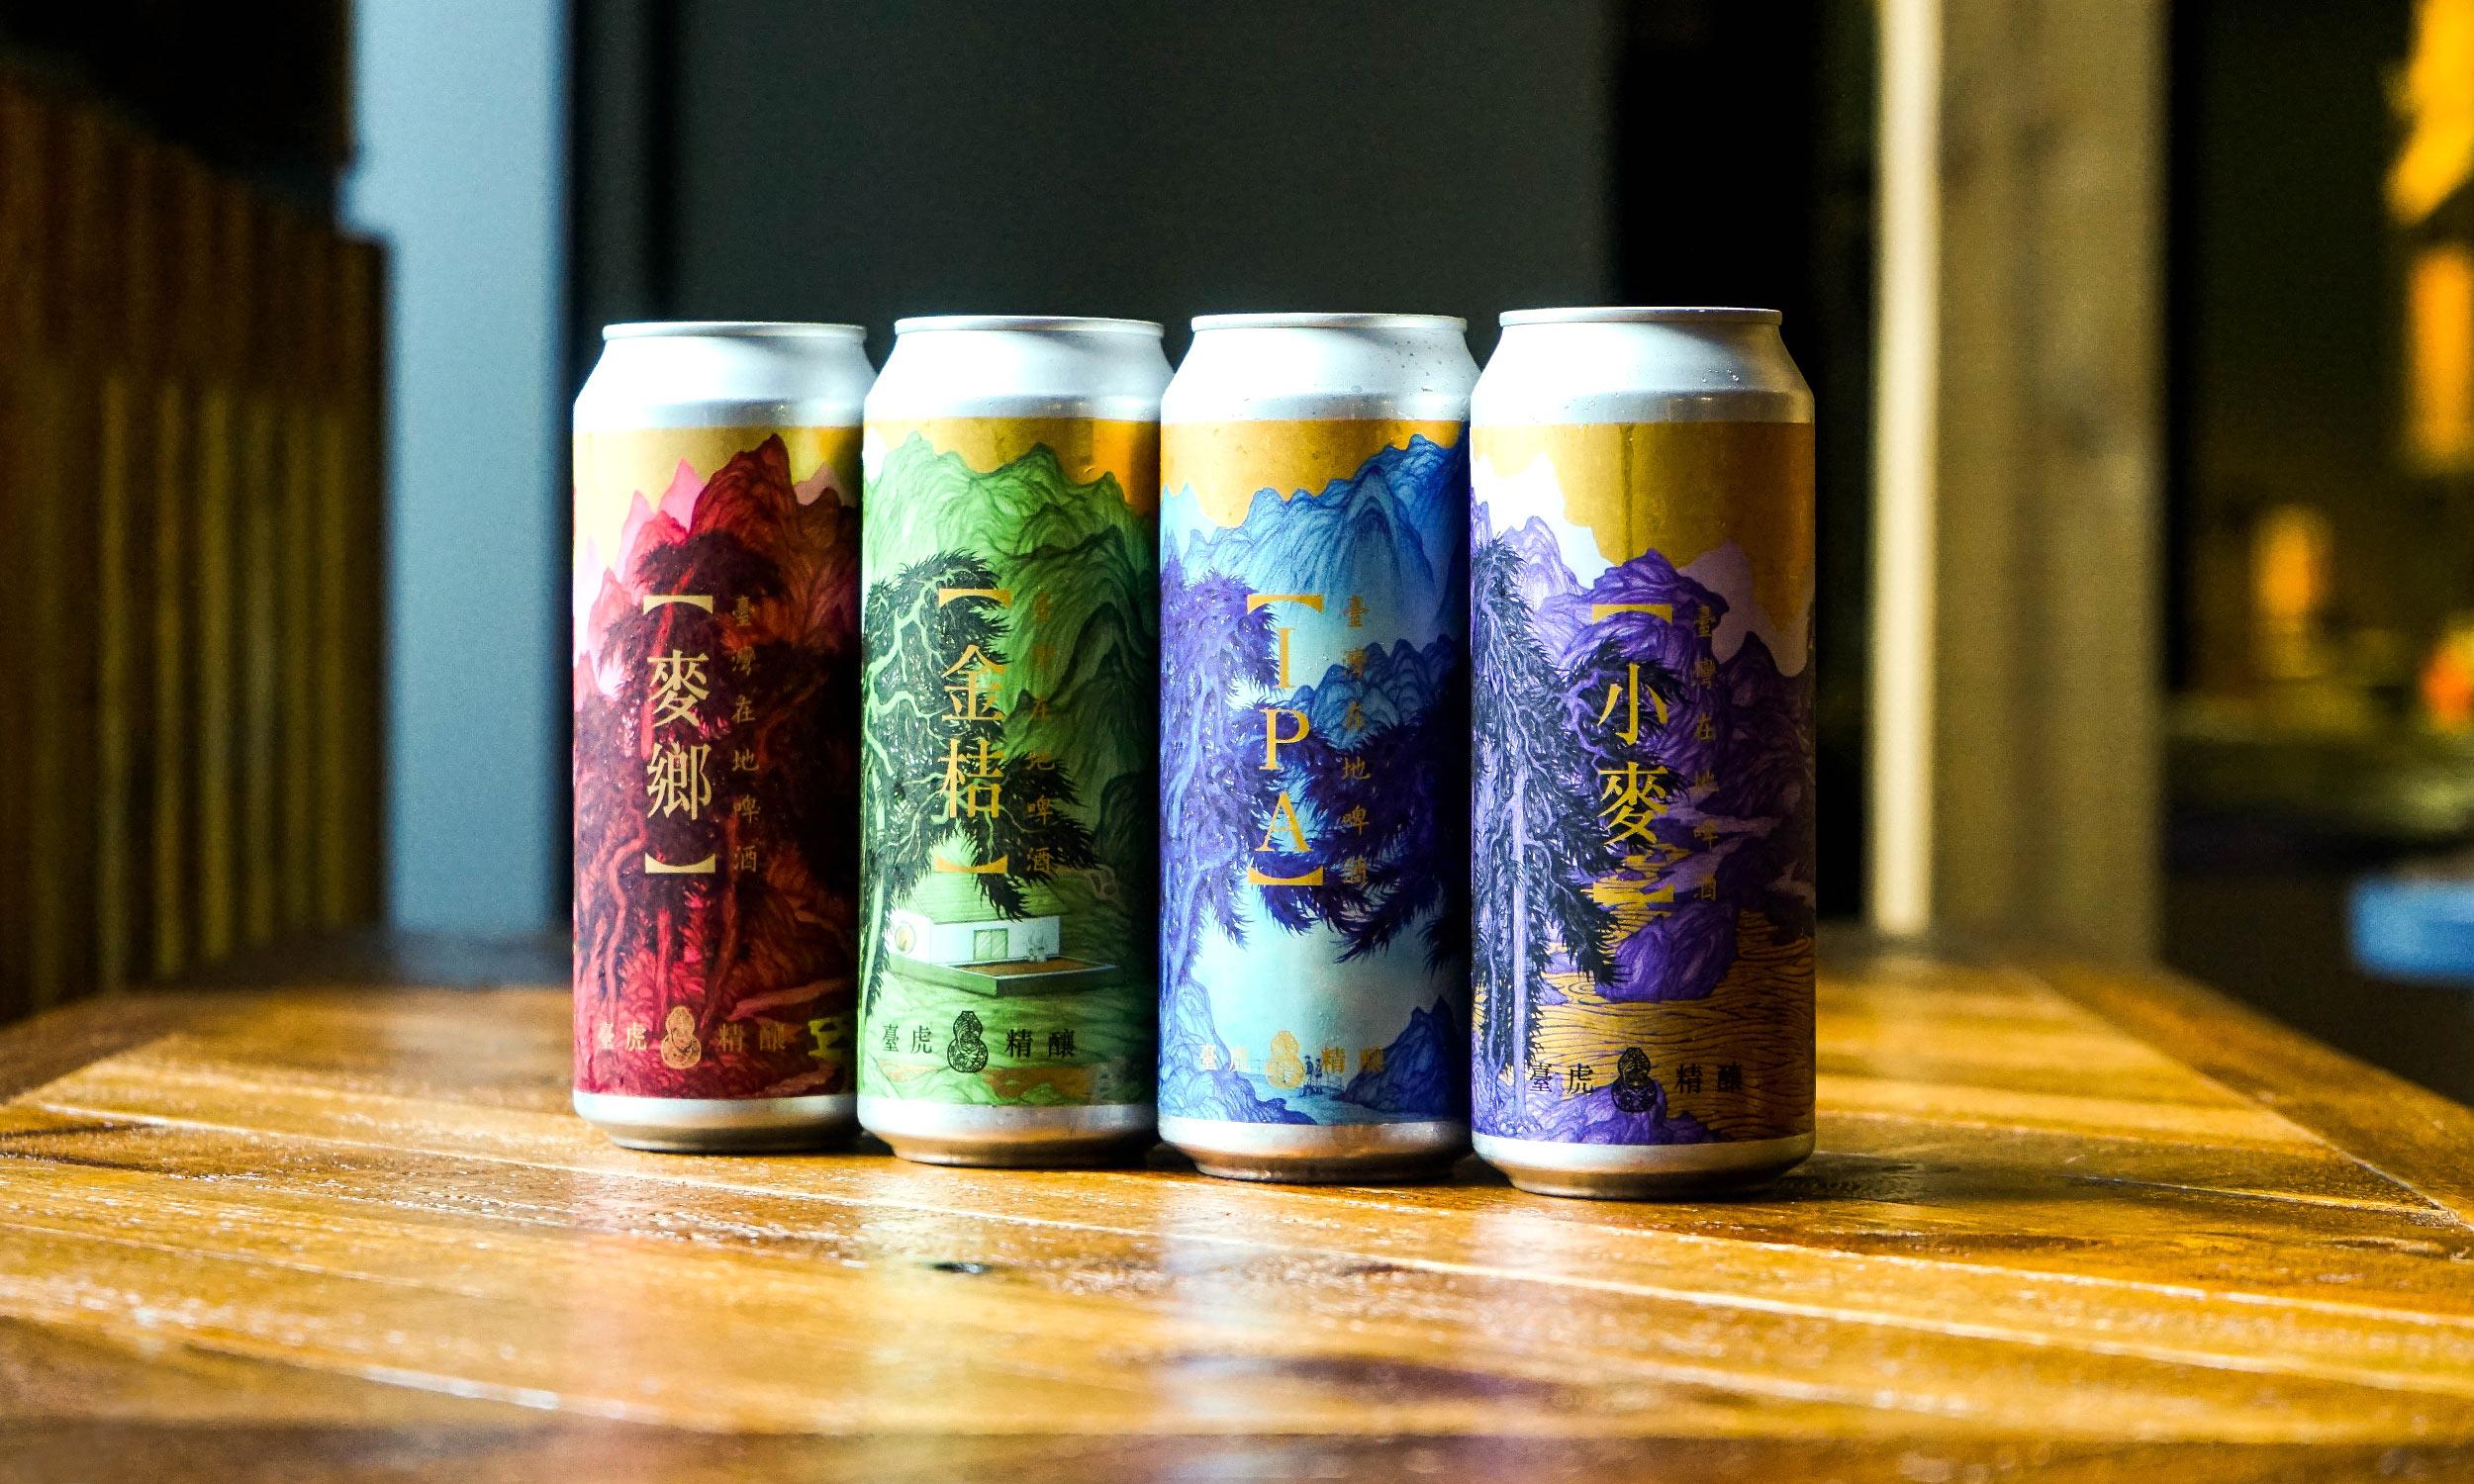 Crafting Beer in Taiwan's Emerging Market